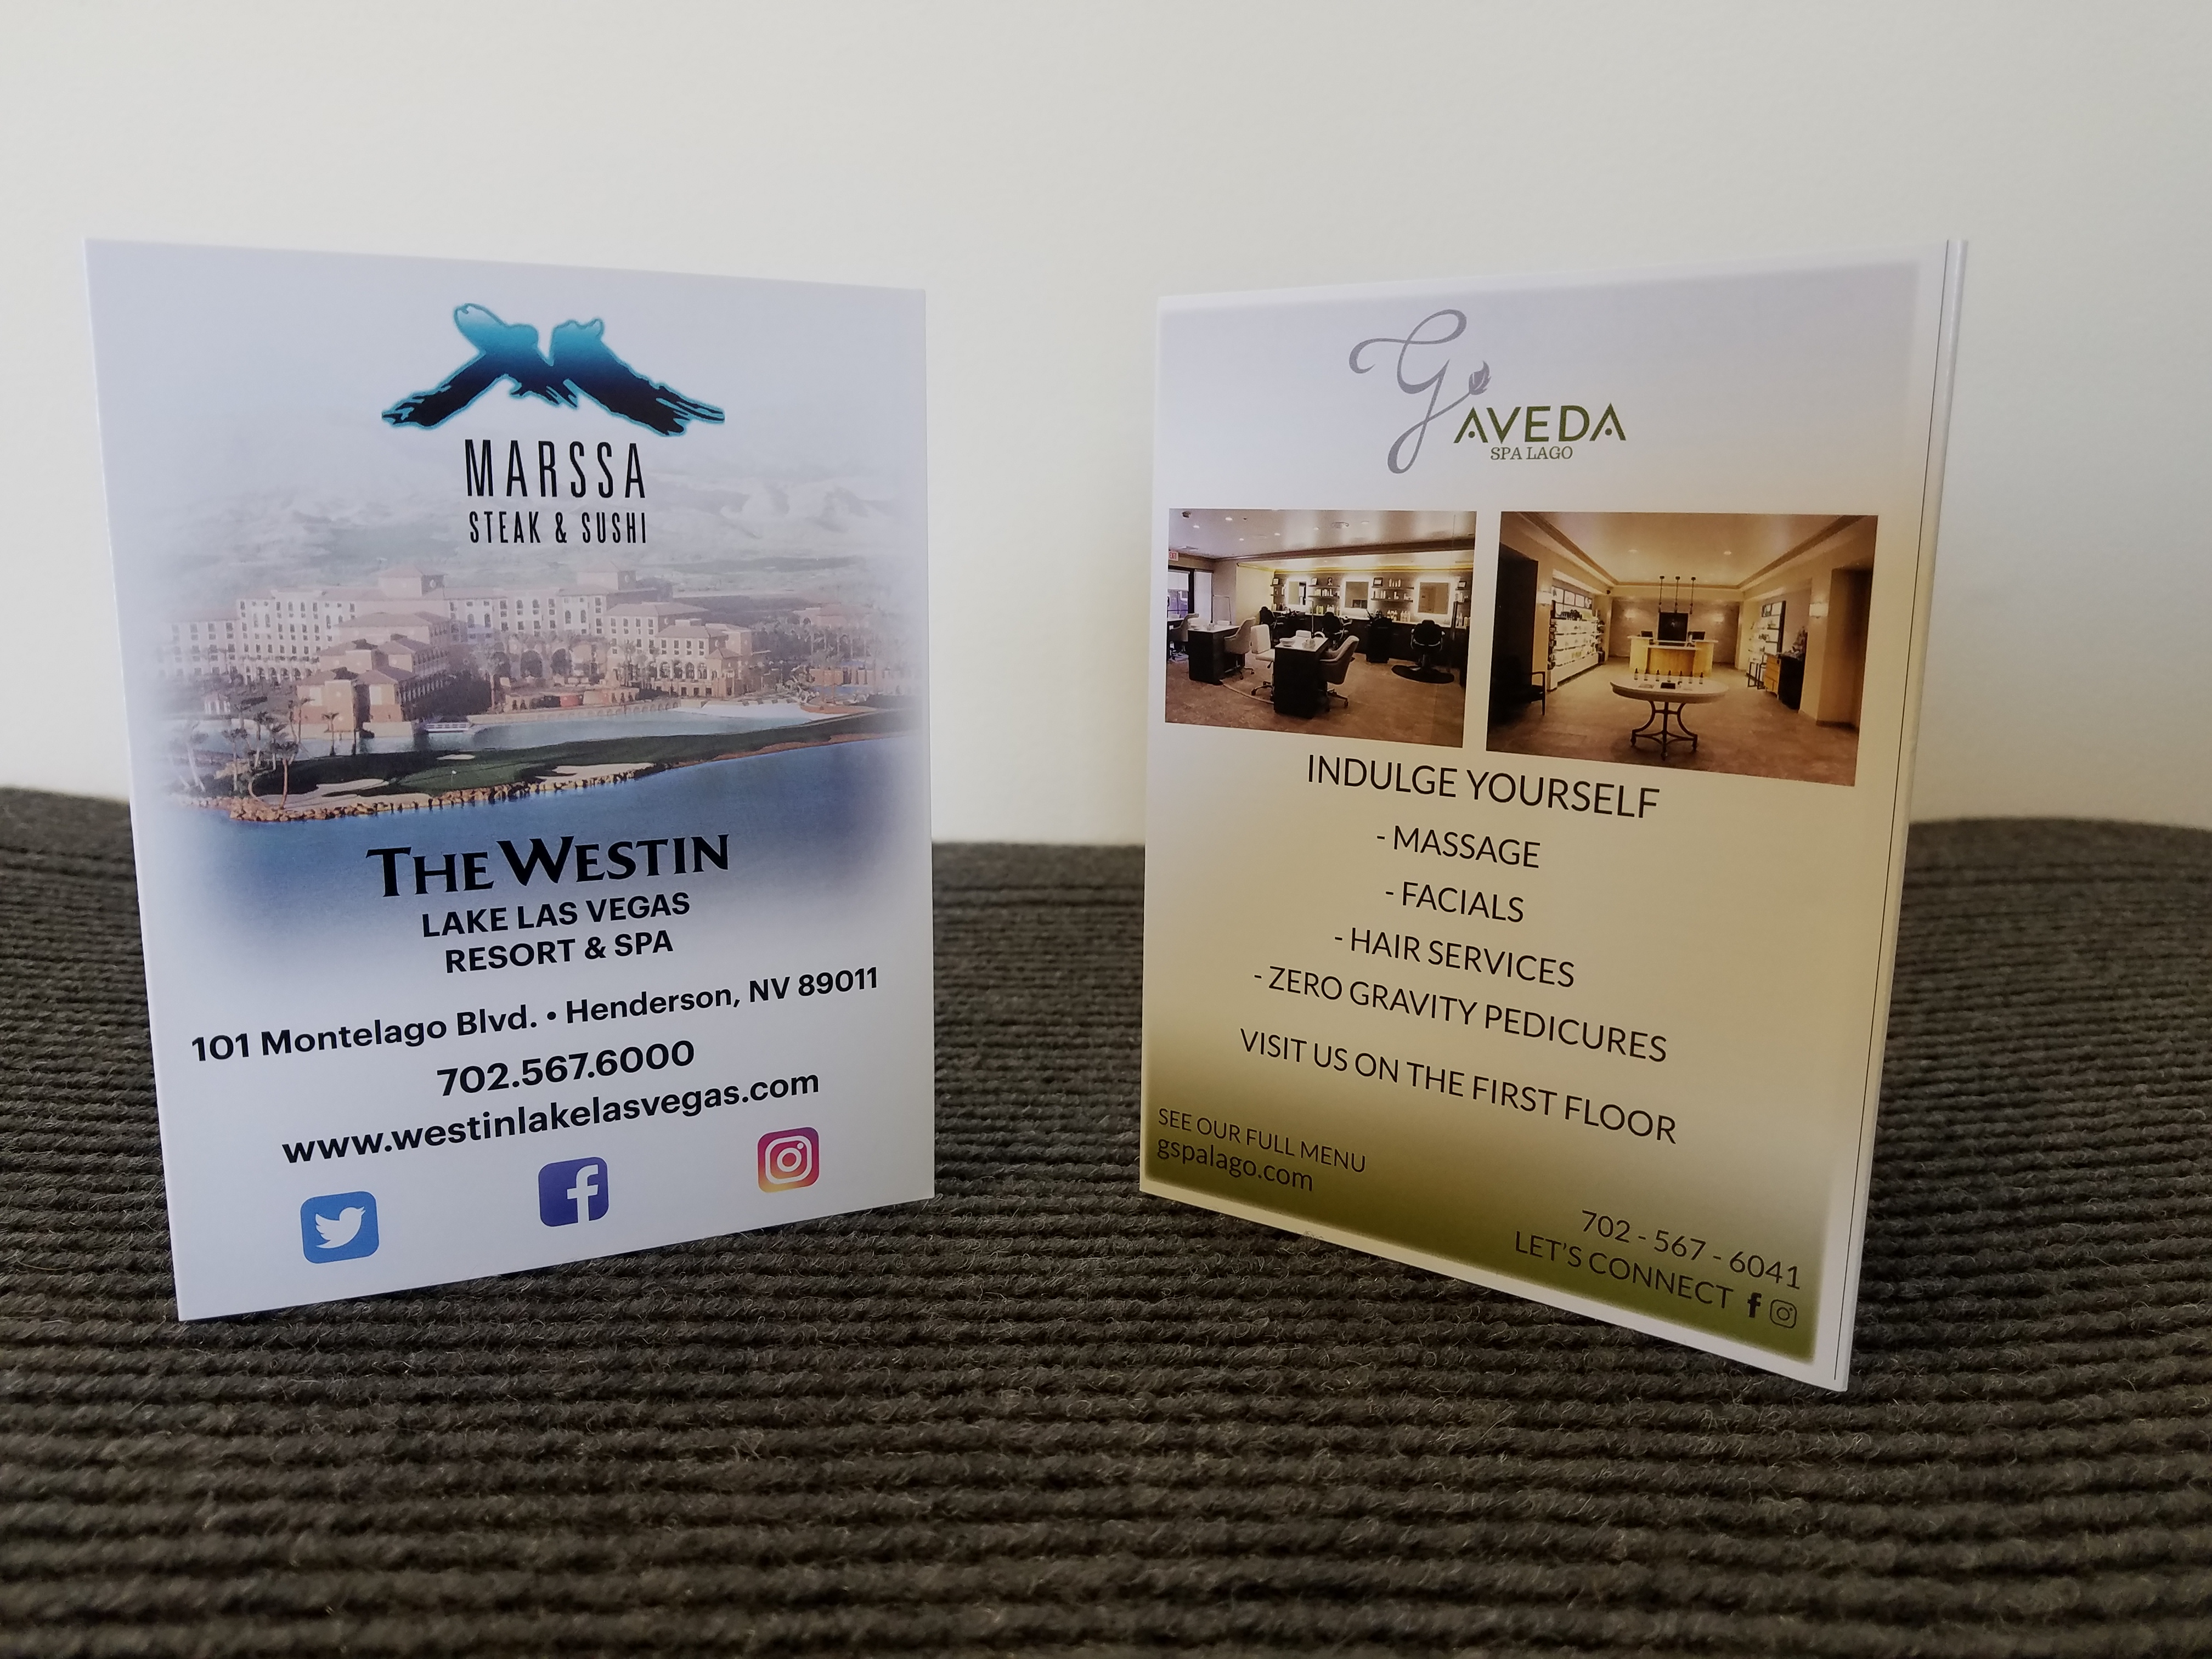 Website Brochure (Westin Marssa G Aveda)